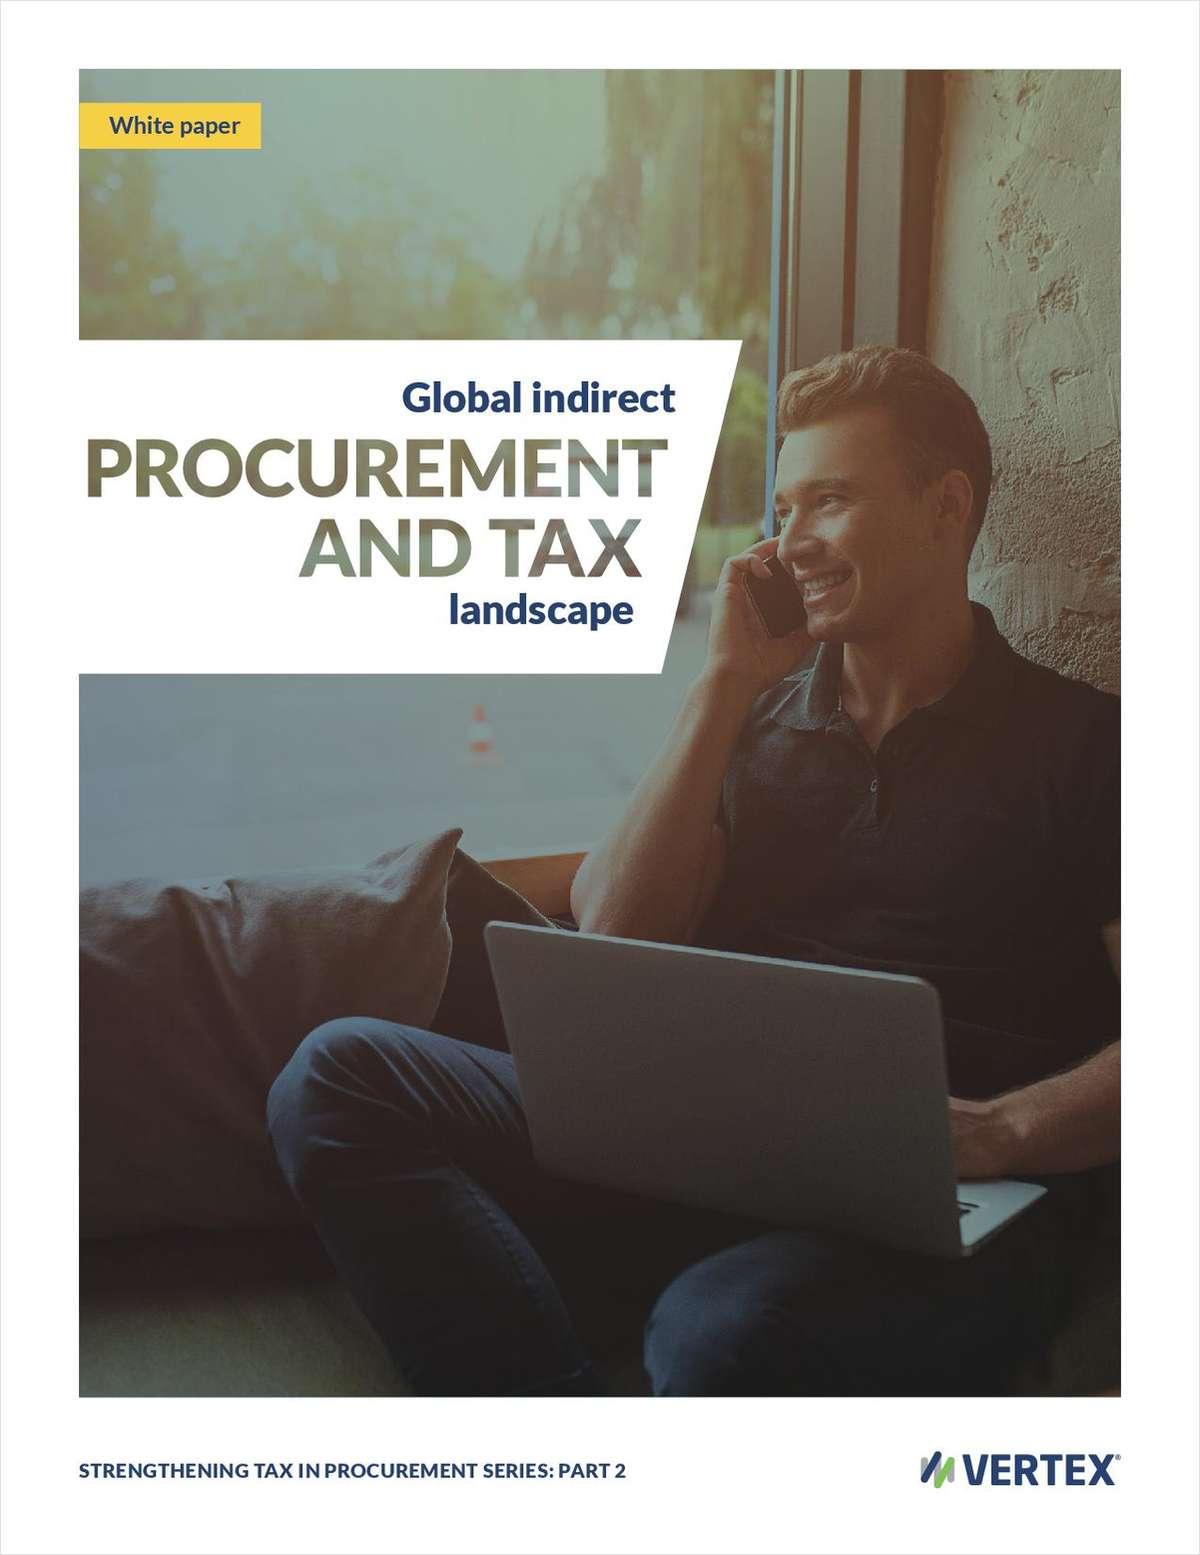 Global indirect procurement and tax landscape